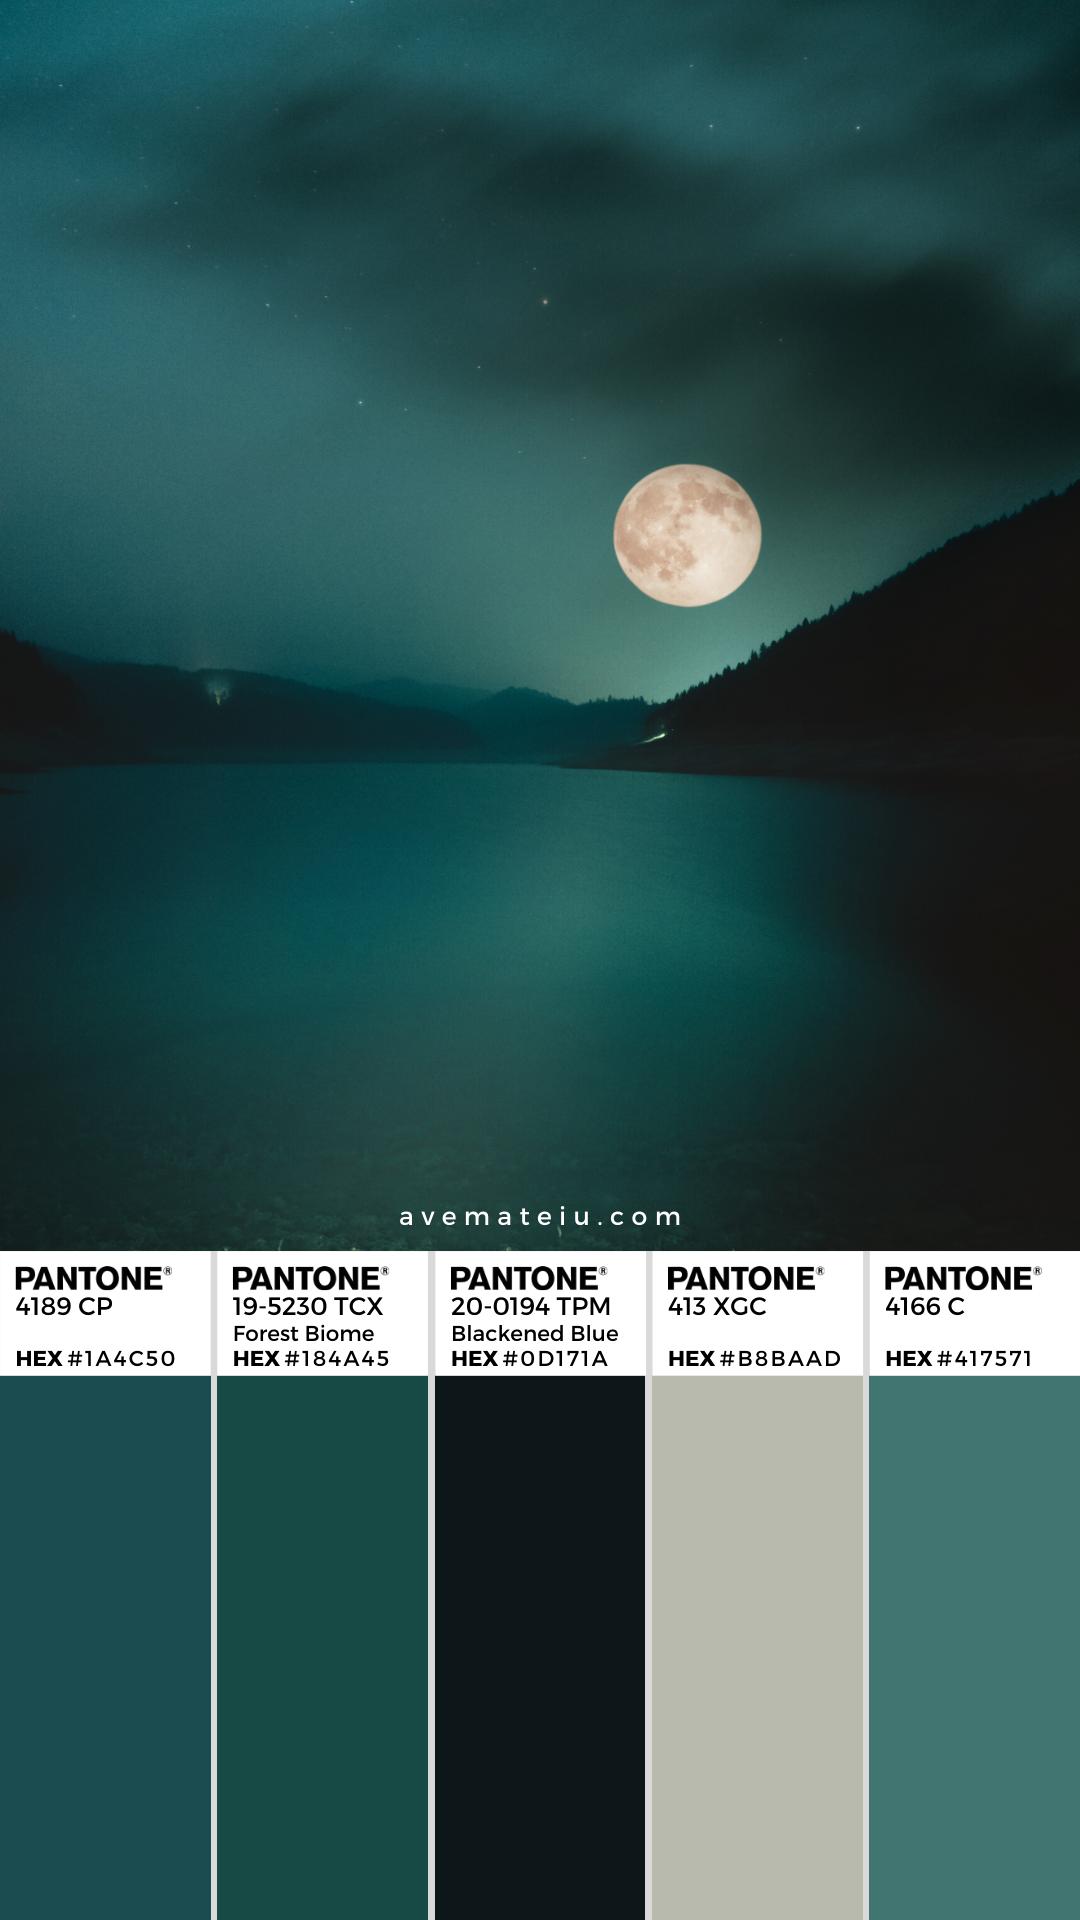 Full Moon over the mountain lake Pantone Color Palette 356